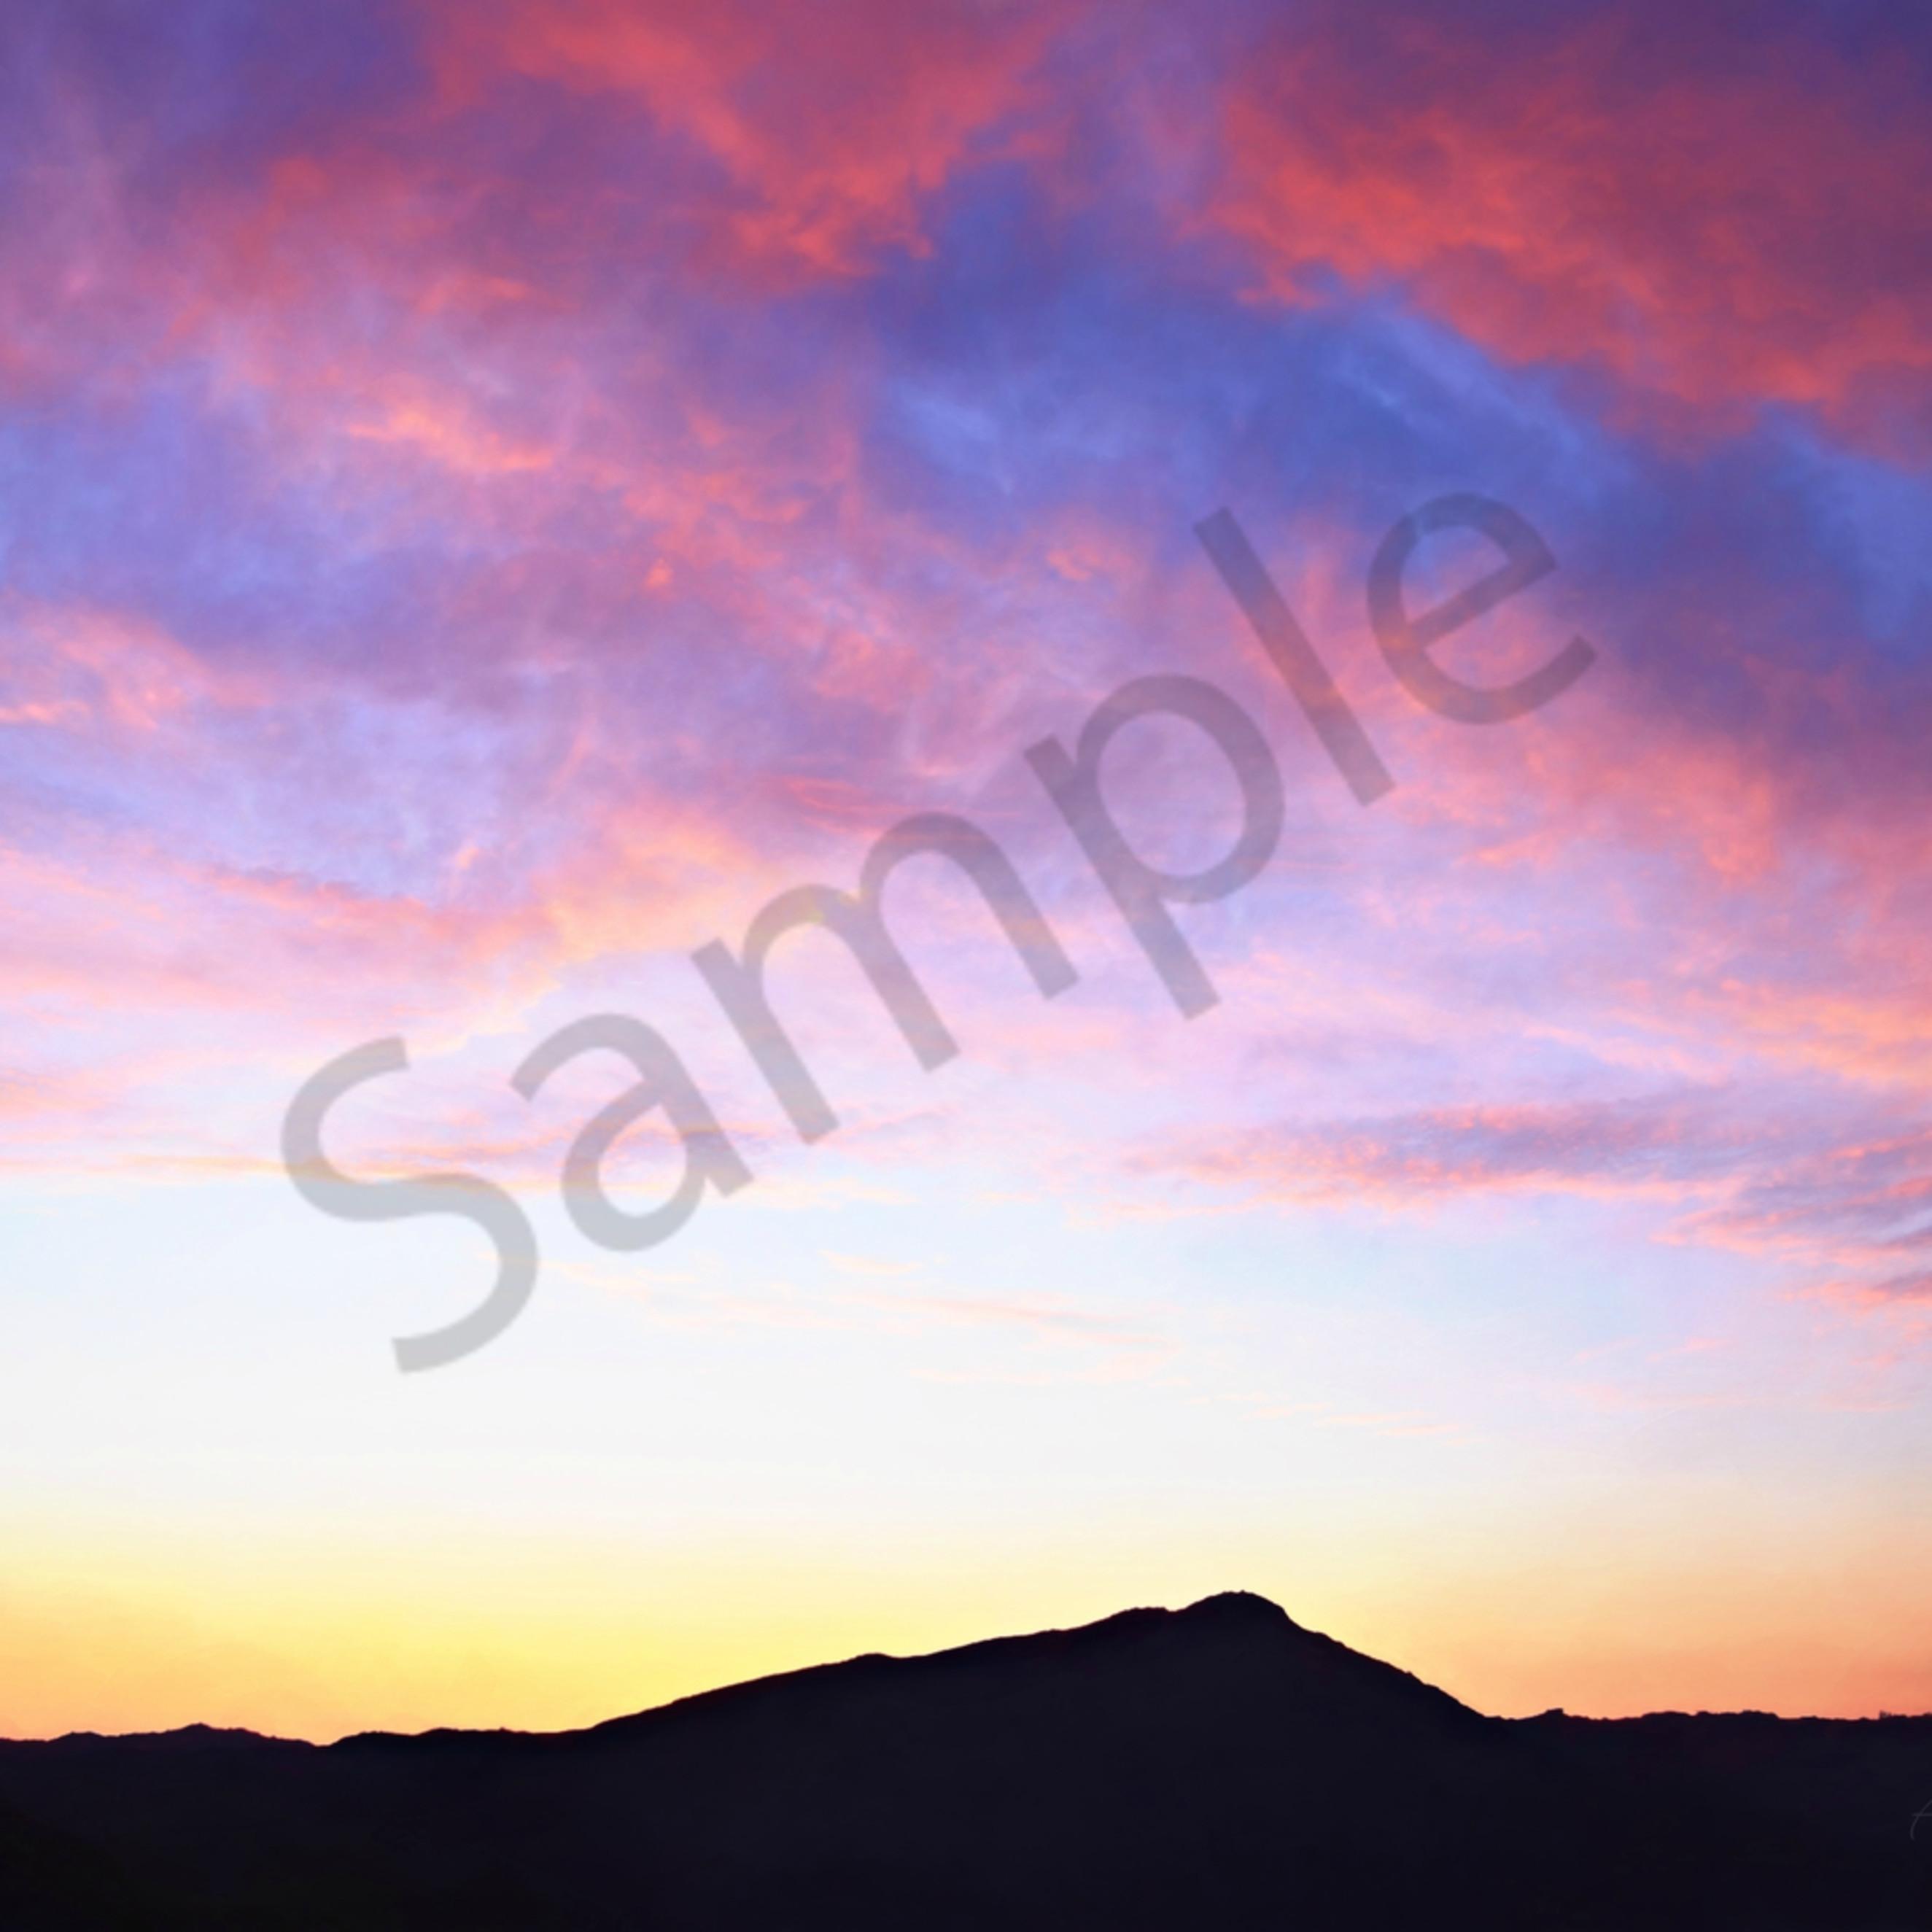 Dsc 5807 sunset nr middle sh20 hgl20 s   topaz watercolor 2013 tag d1frmm